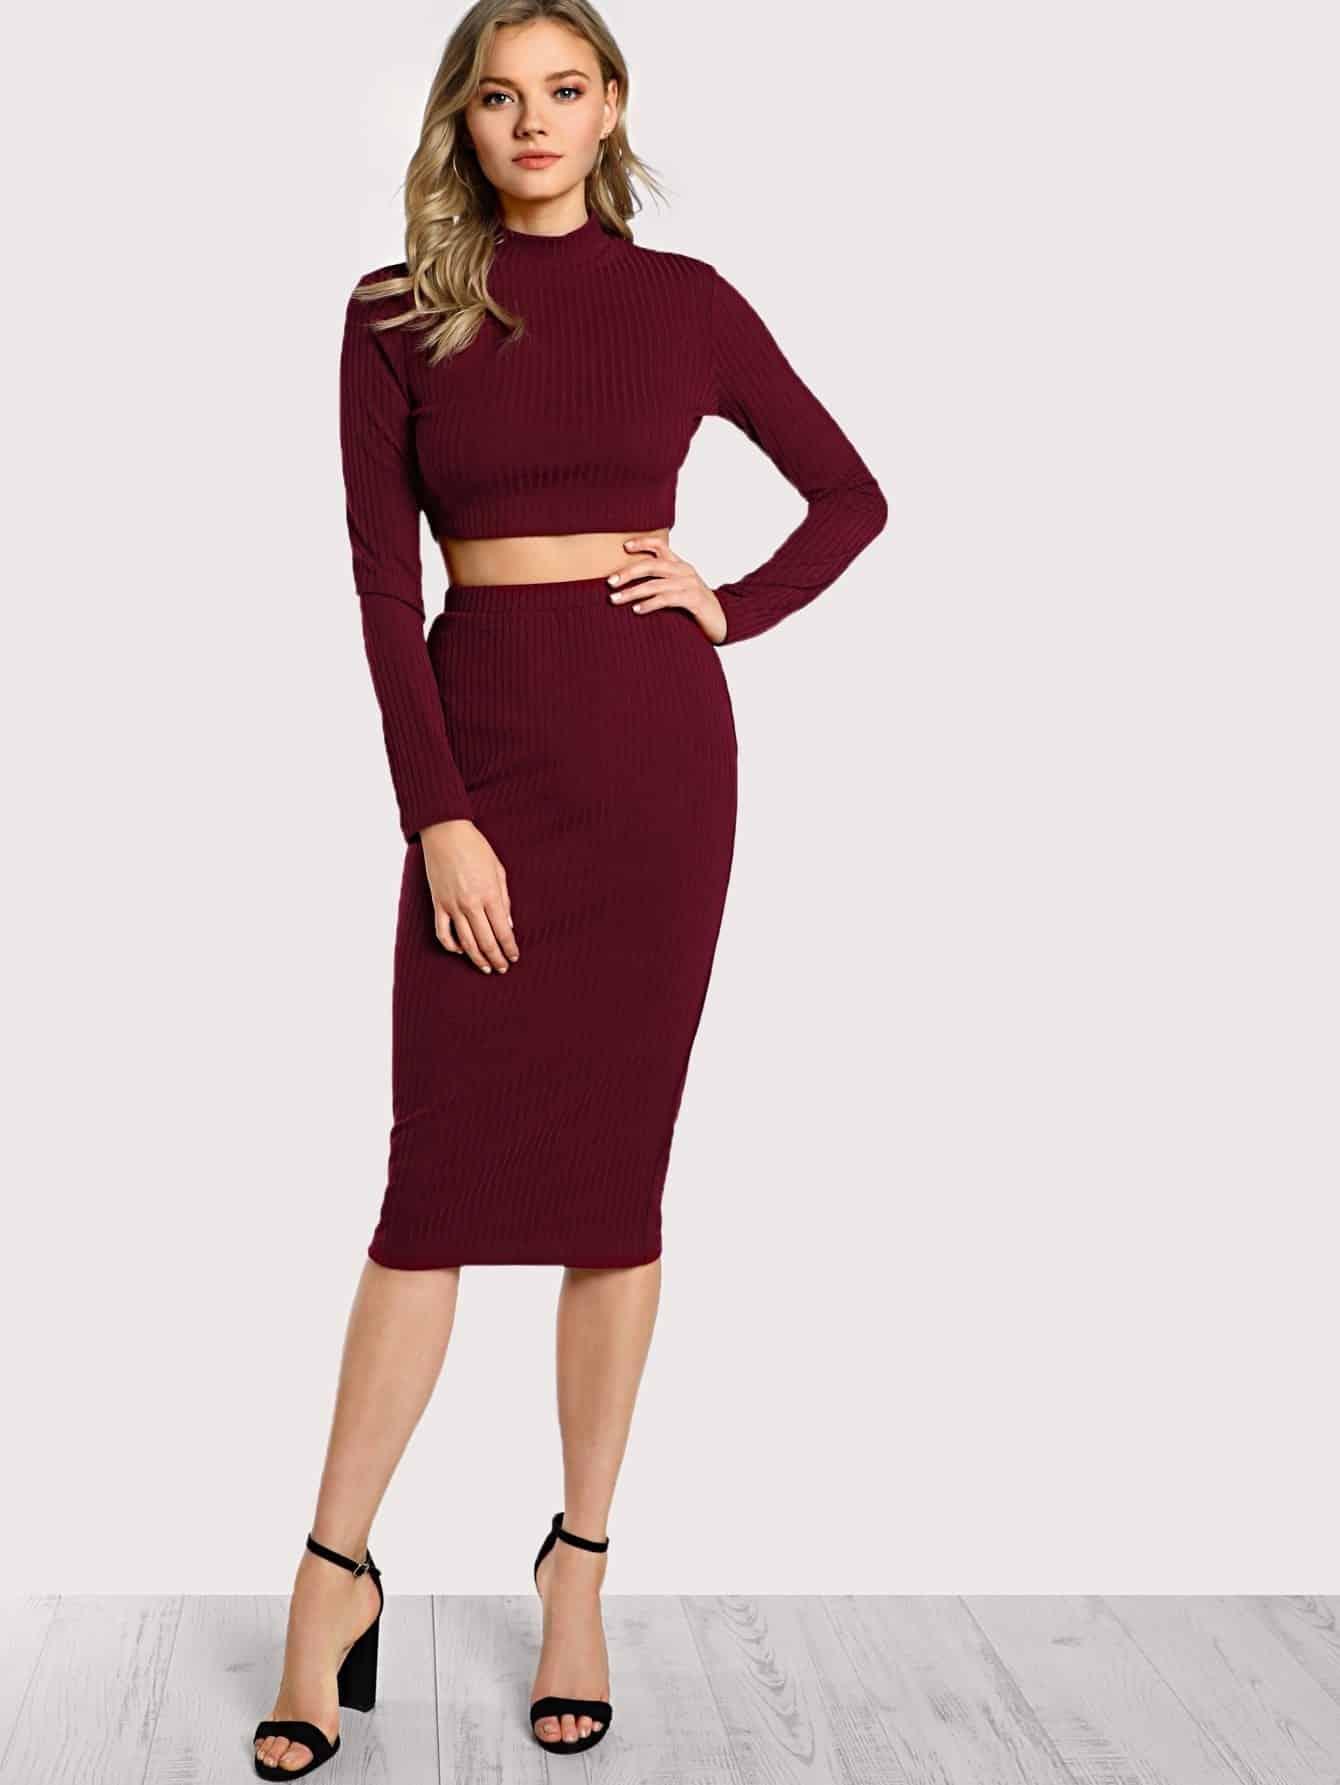 High Neck Crop Top & Pencil Skirt Set